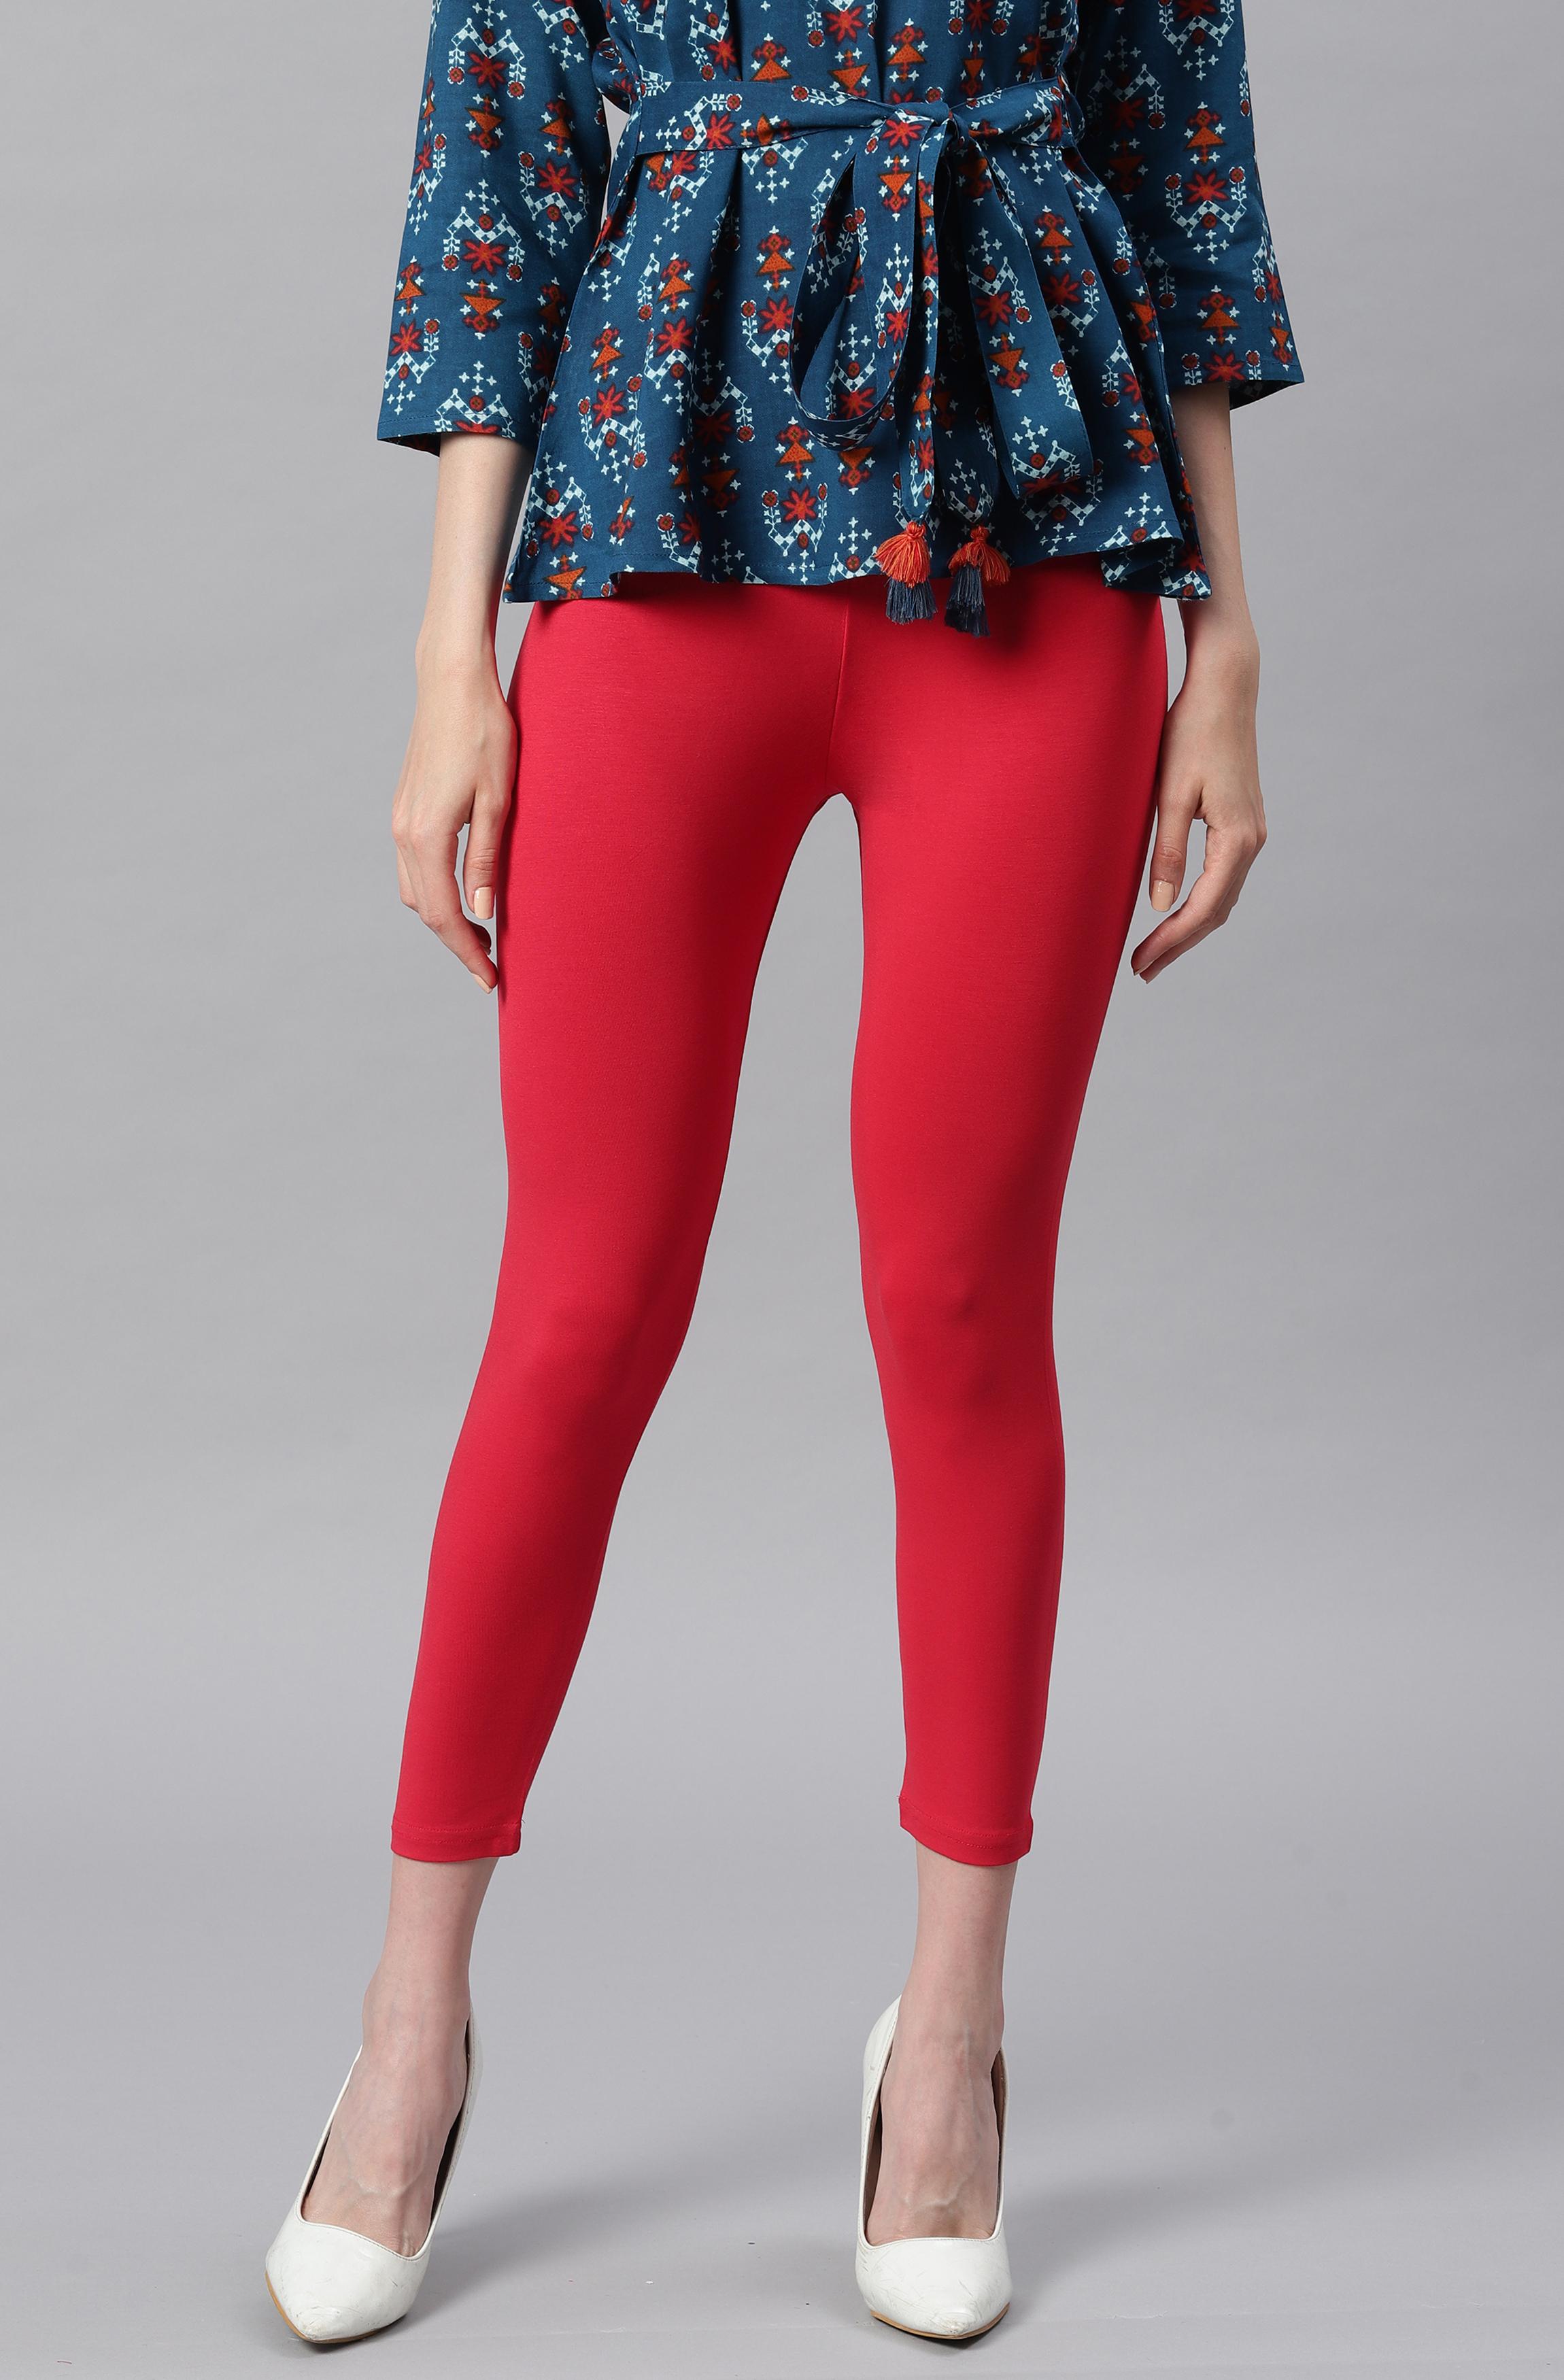 Janasya | Janasya Women's Red Viscose Lycra Leggings